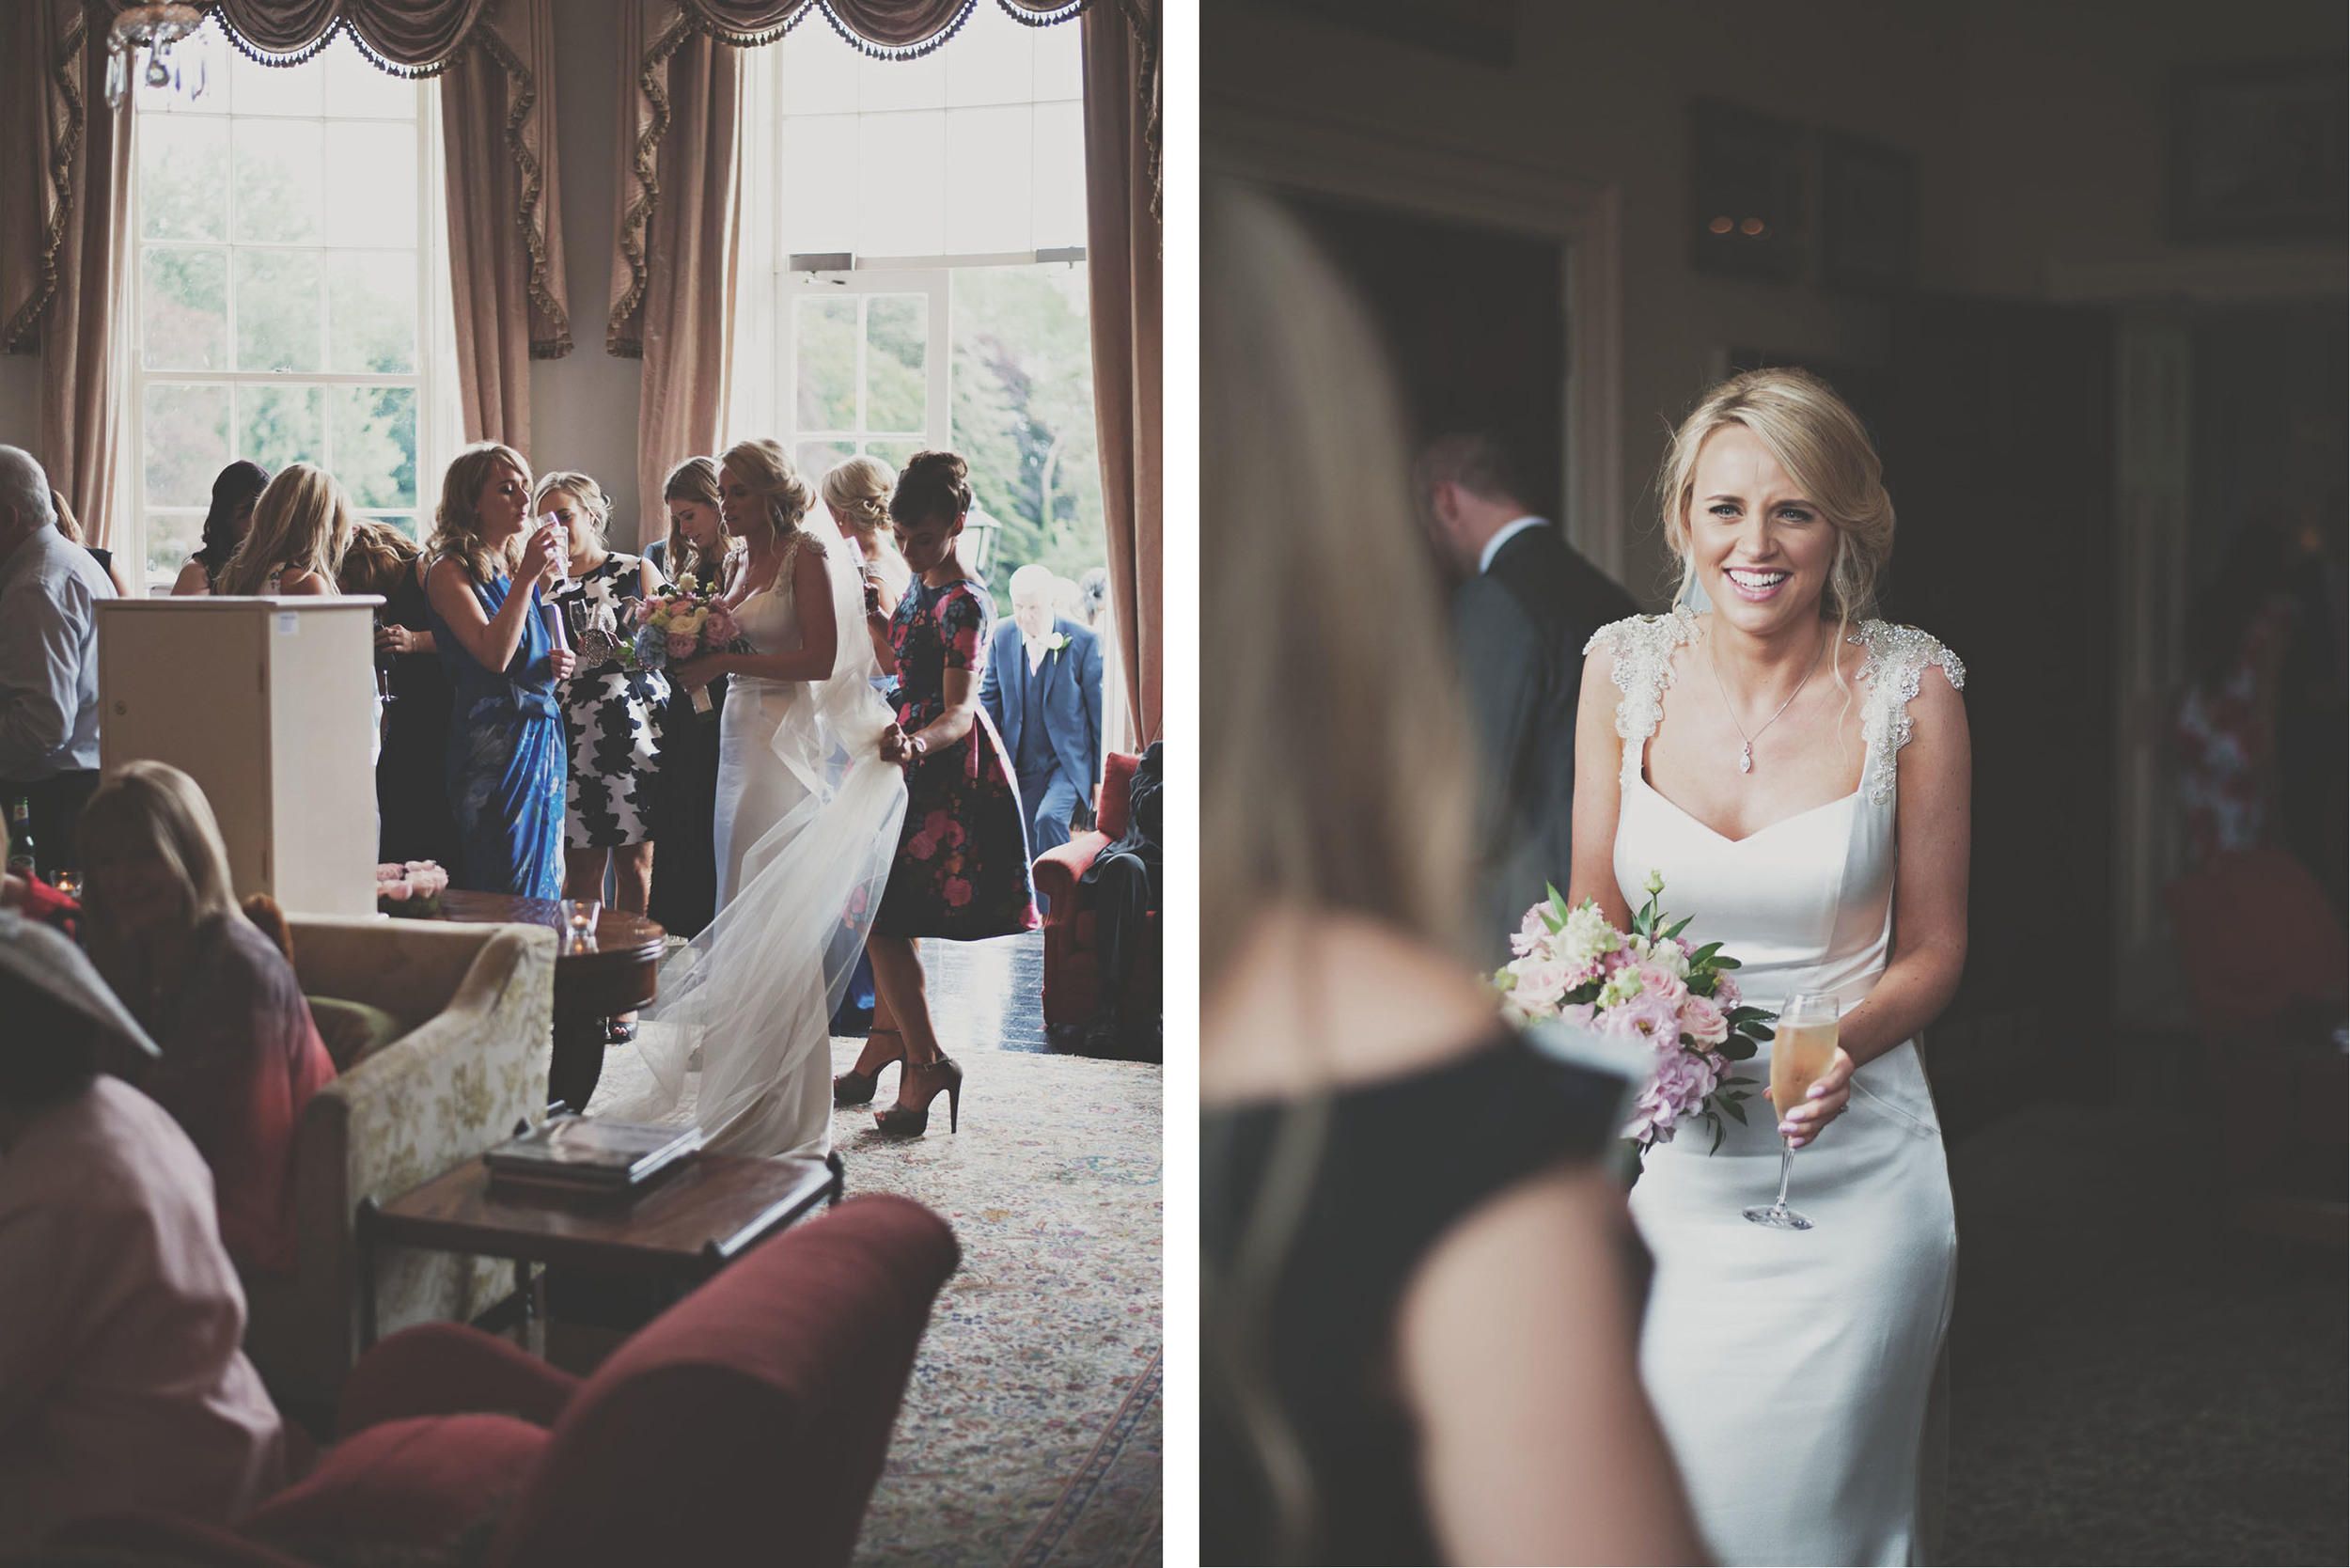 Gillian & Robbie's K Club Wedding 107.jpg